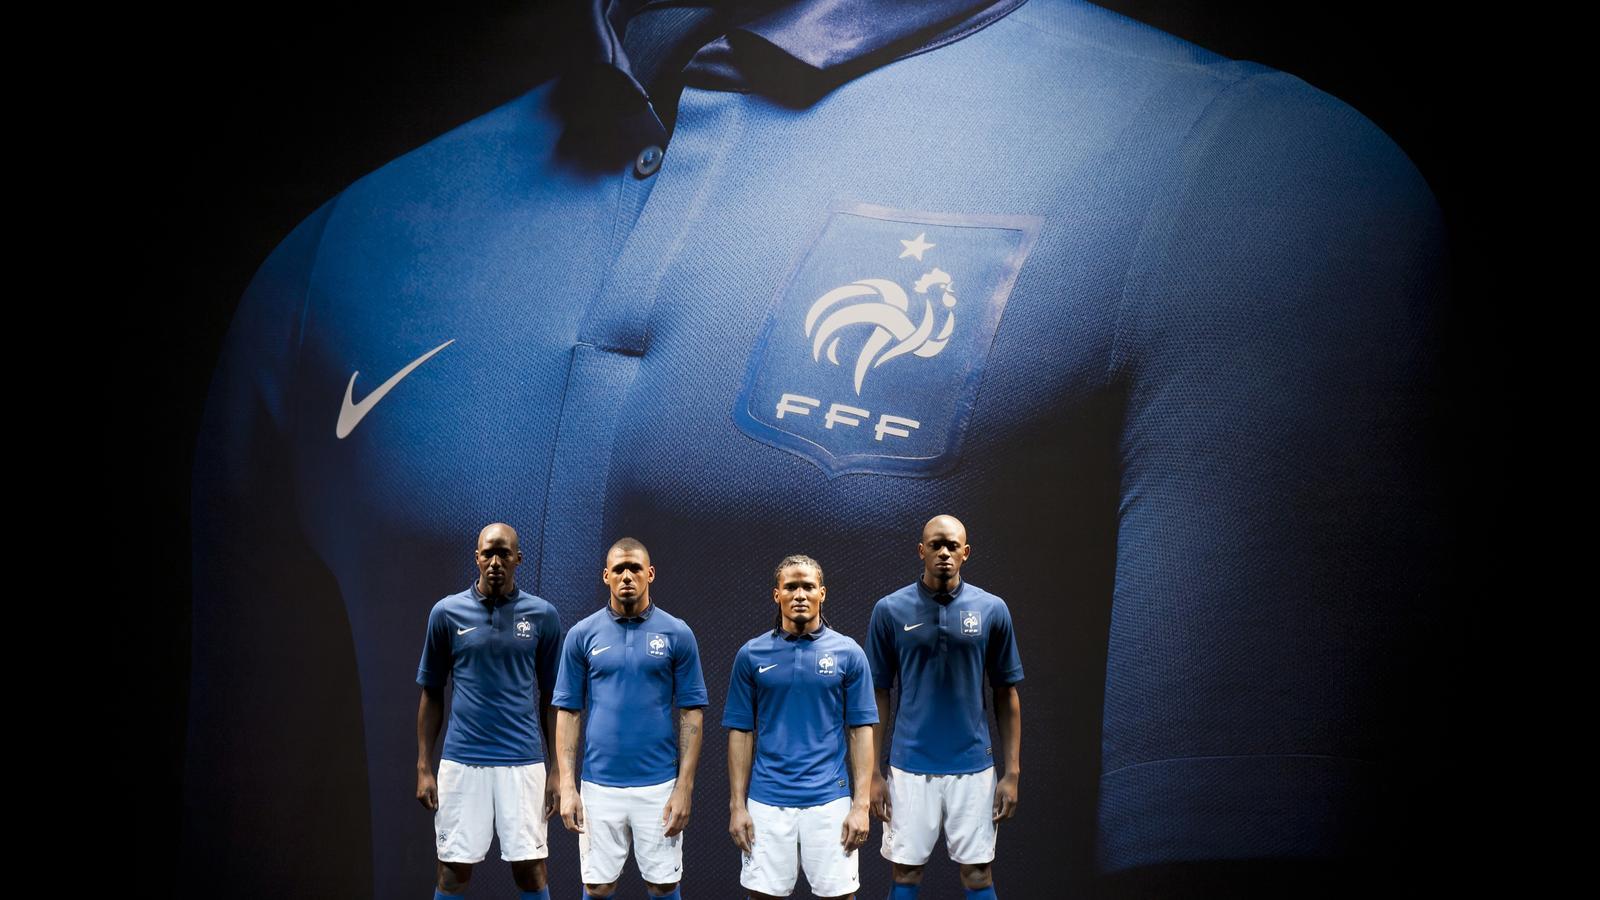 3e87c0d2f Nike French Football Kit. NikeFFF_5Joueurs_016_SansTypo02_hi